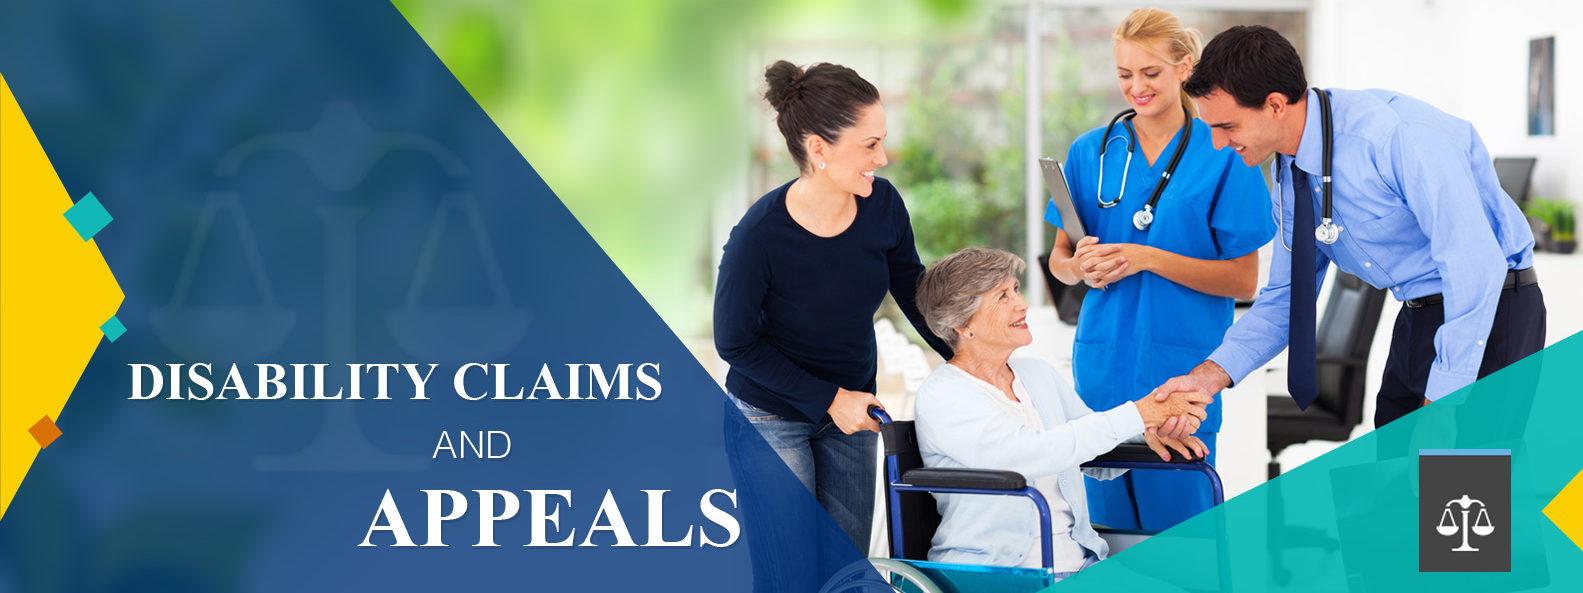 disability-claims-and-appeals-Ambwani